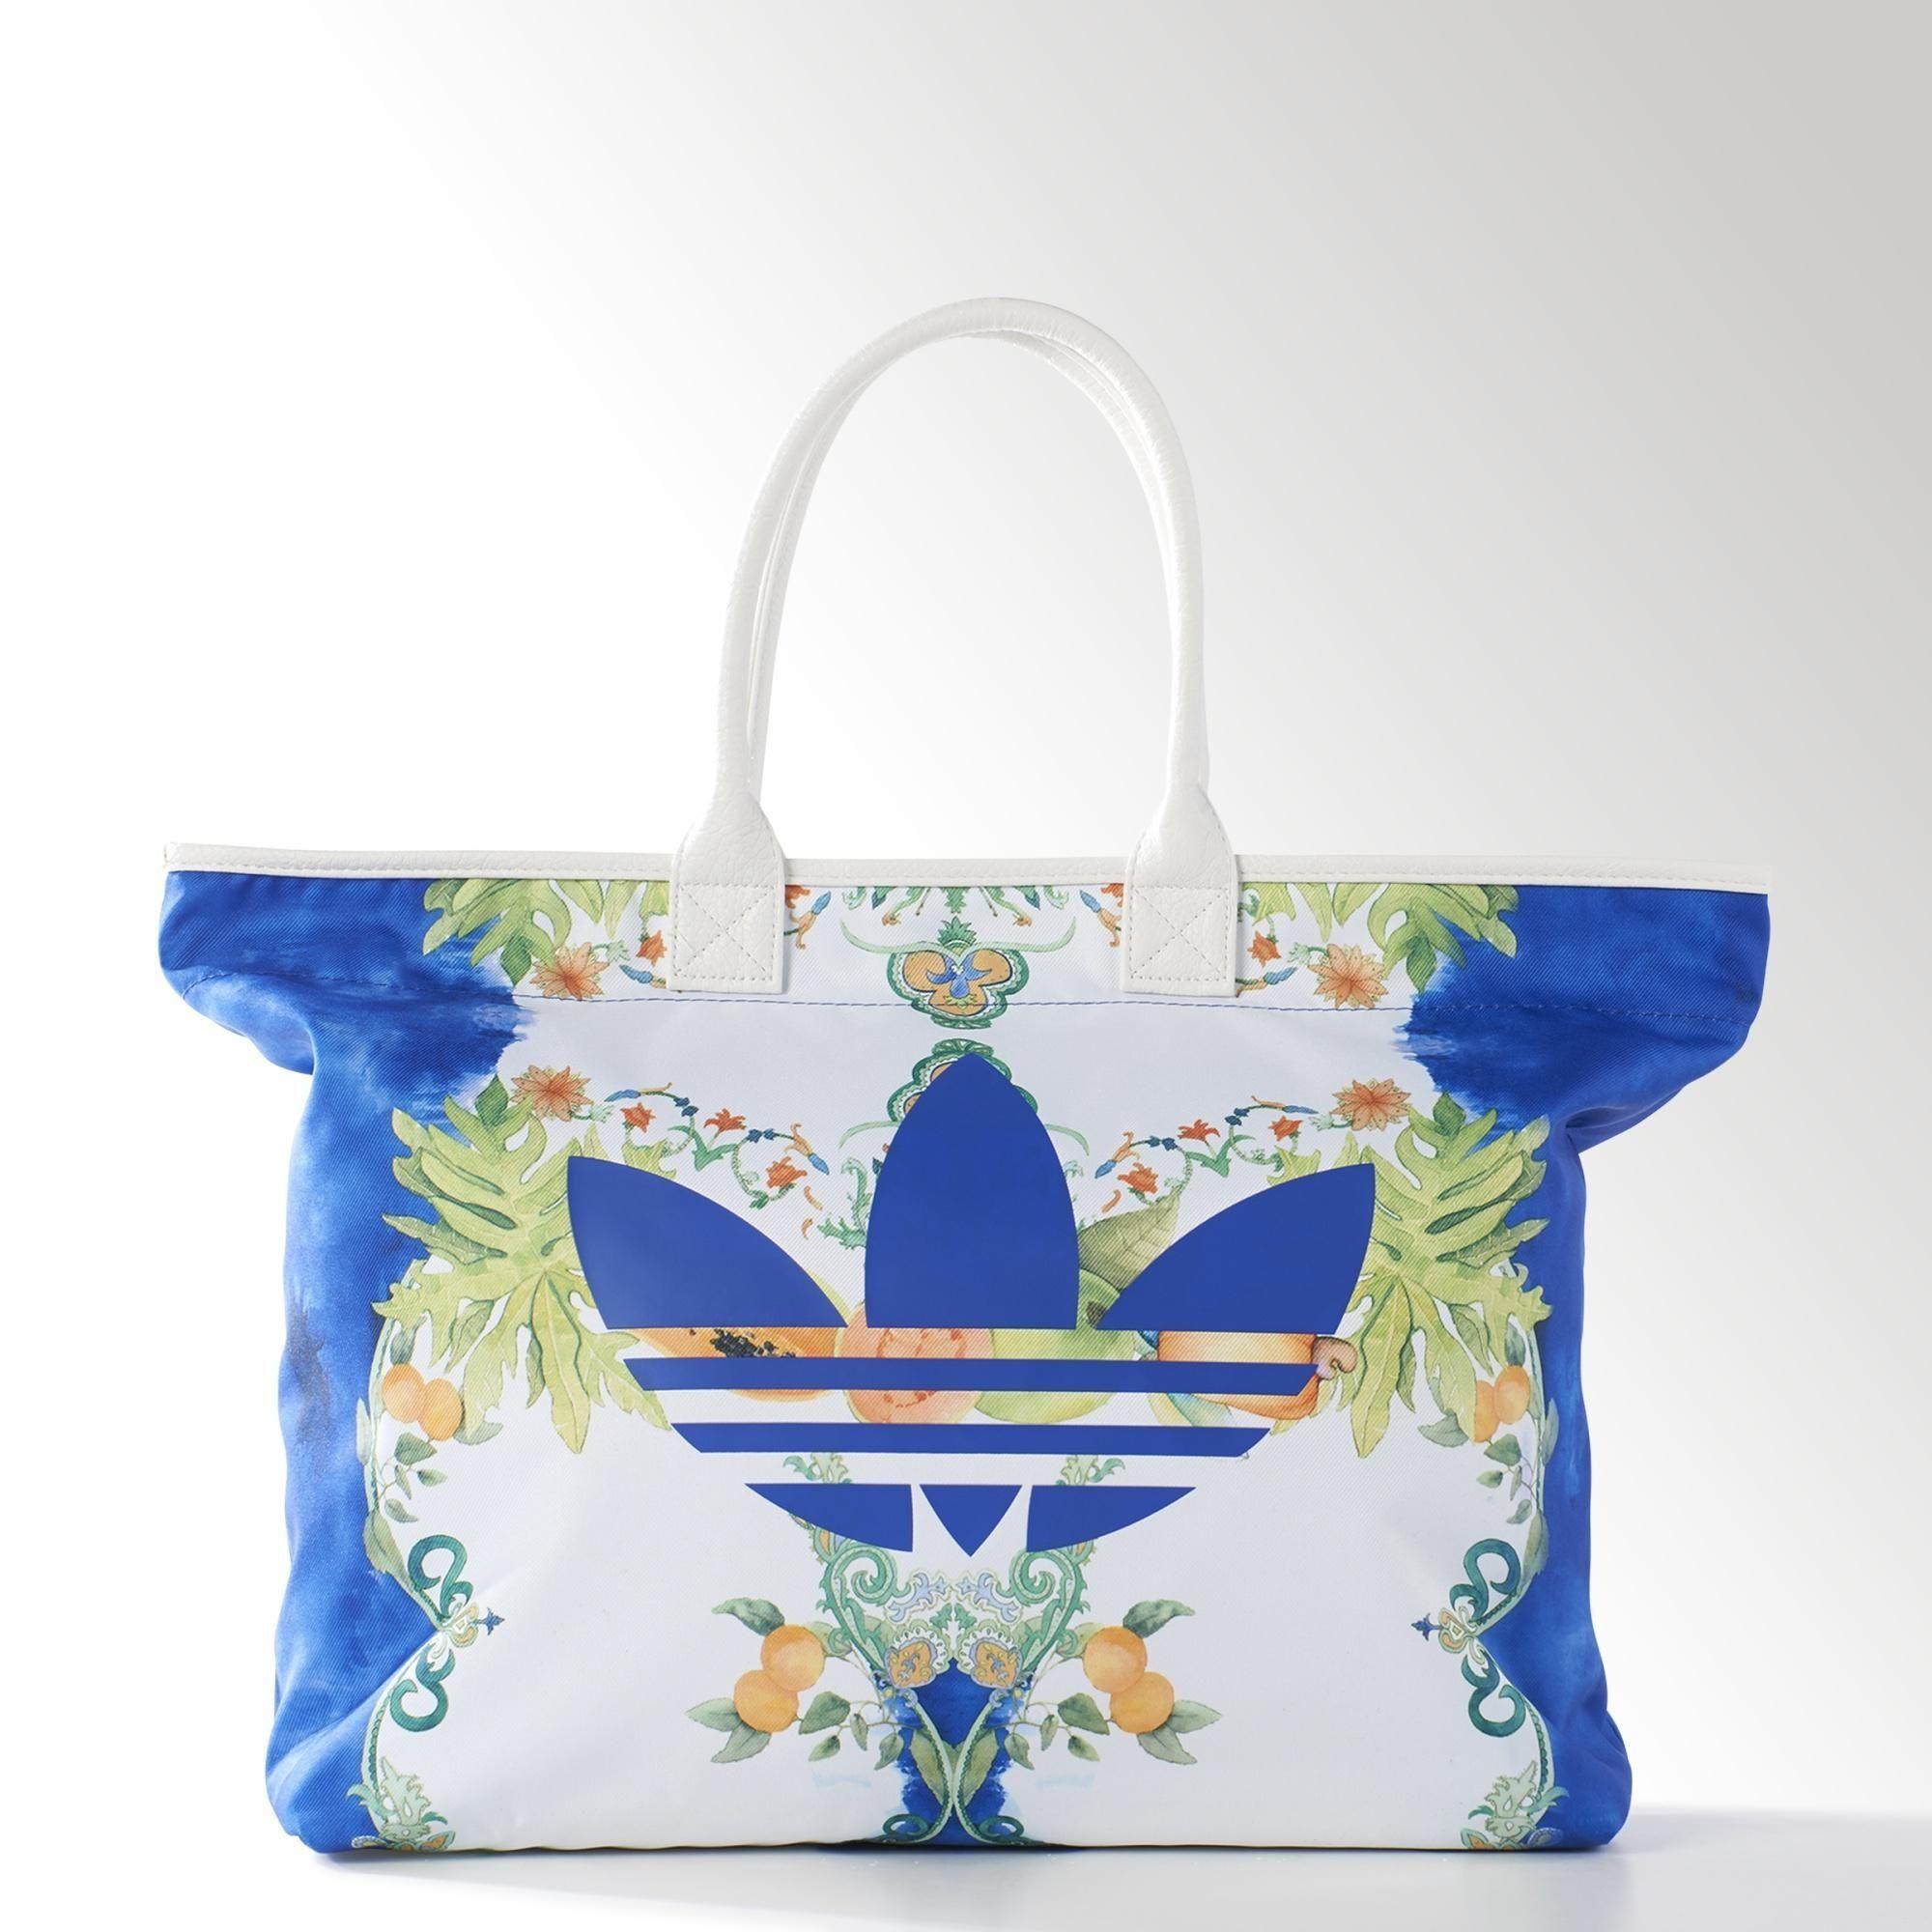 adidas Bolsa Originals FARM Indigo Beach Shopper Mujer en